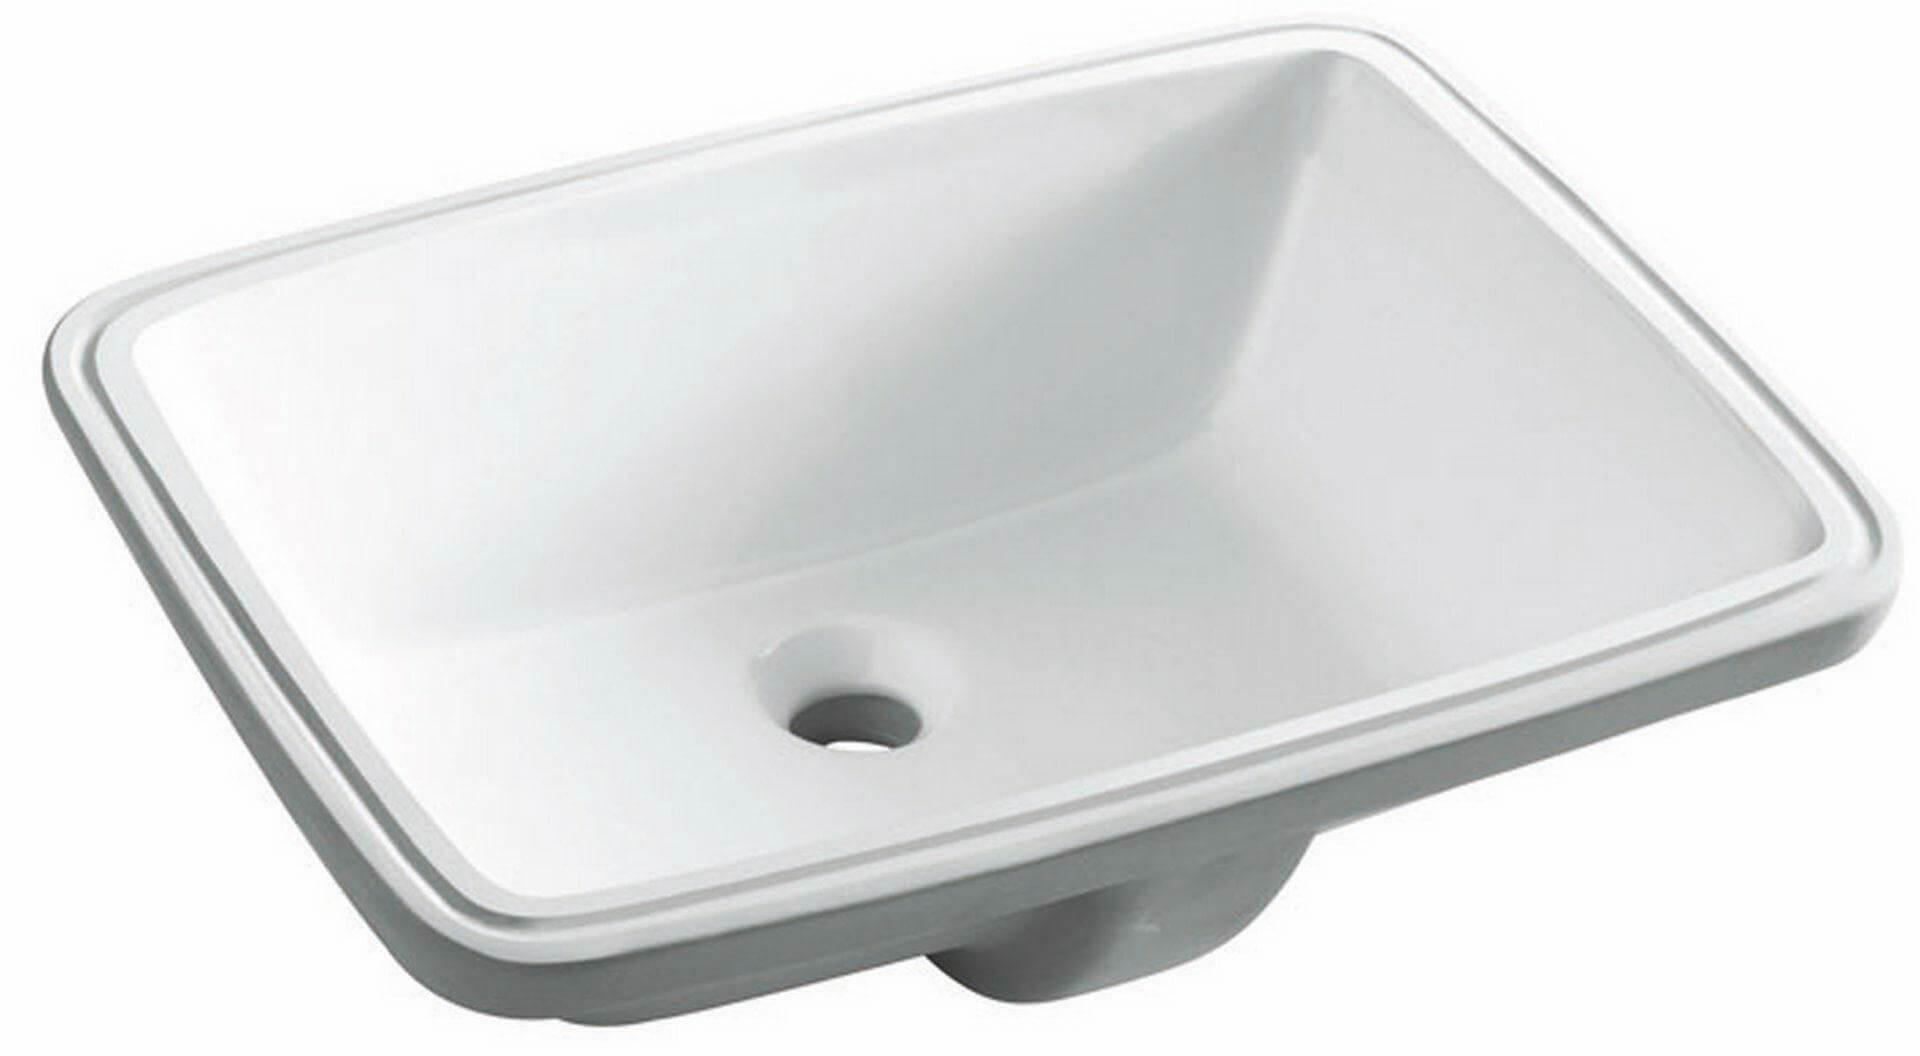 Umywalka podblatowa, Torino 0051, biała